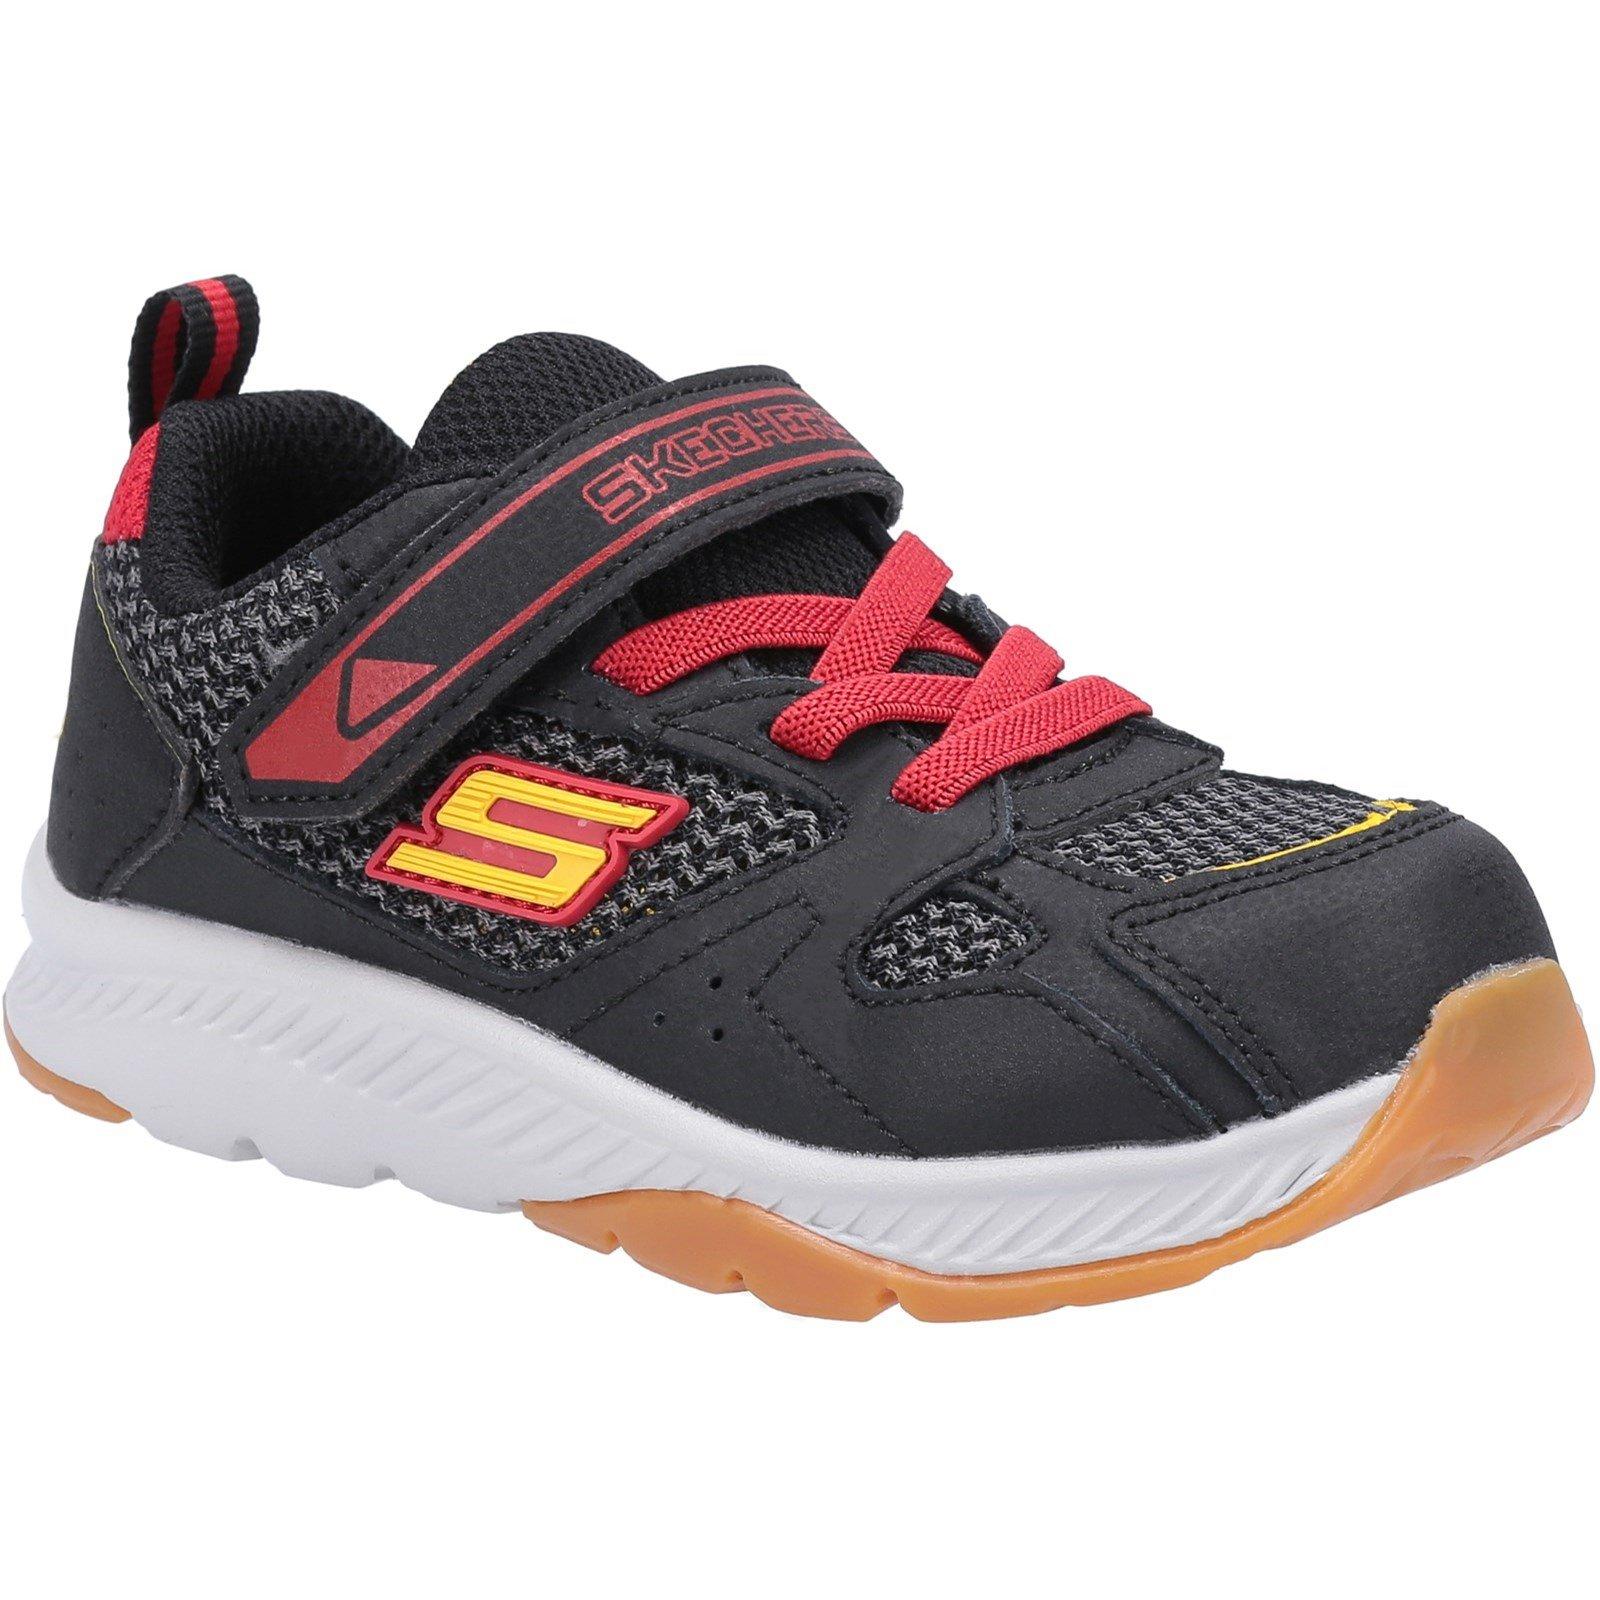 Skechers Kid's Comfy Grip Trainer Multicolor 30424 - Black/Red 4